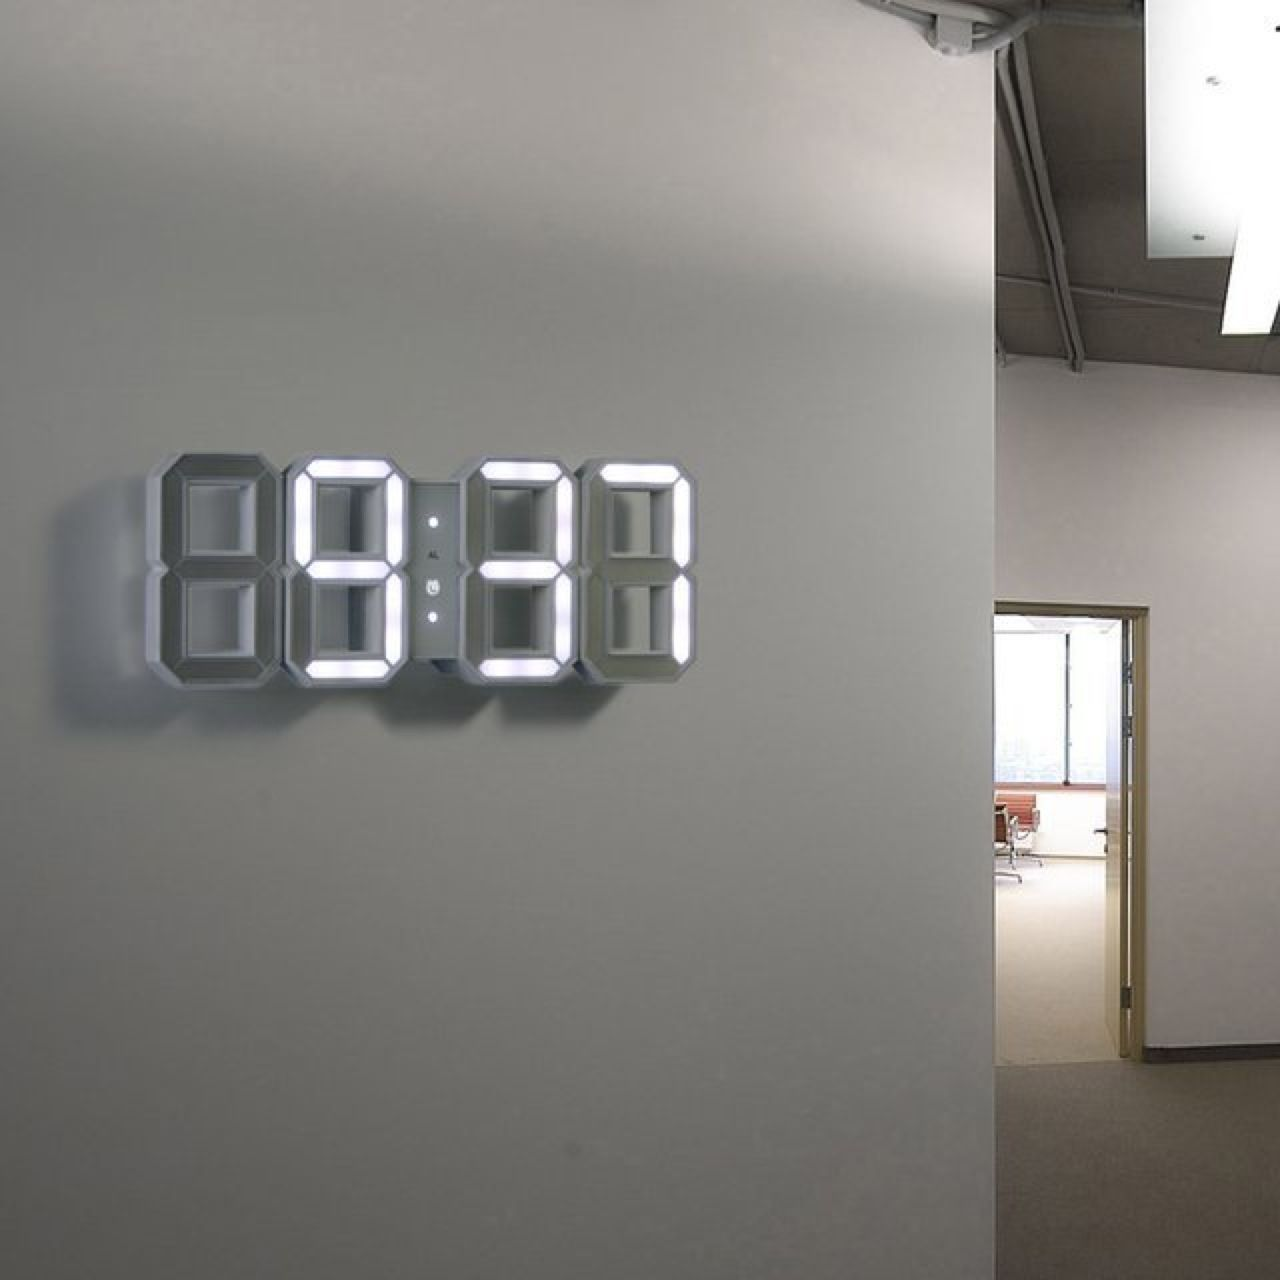 Agreable White U0026amp; White LED Clock By Kibardin Design Digital Wall, Digital  Clocks, Digital